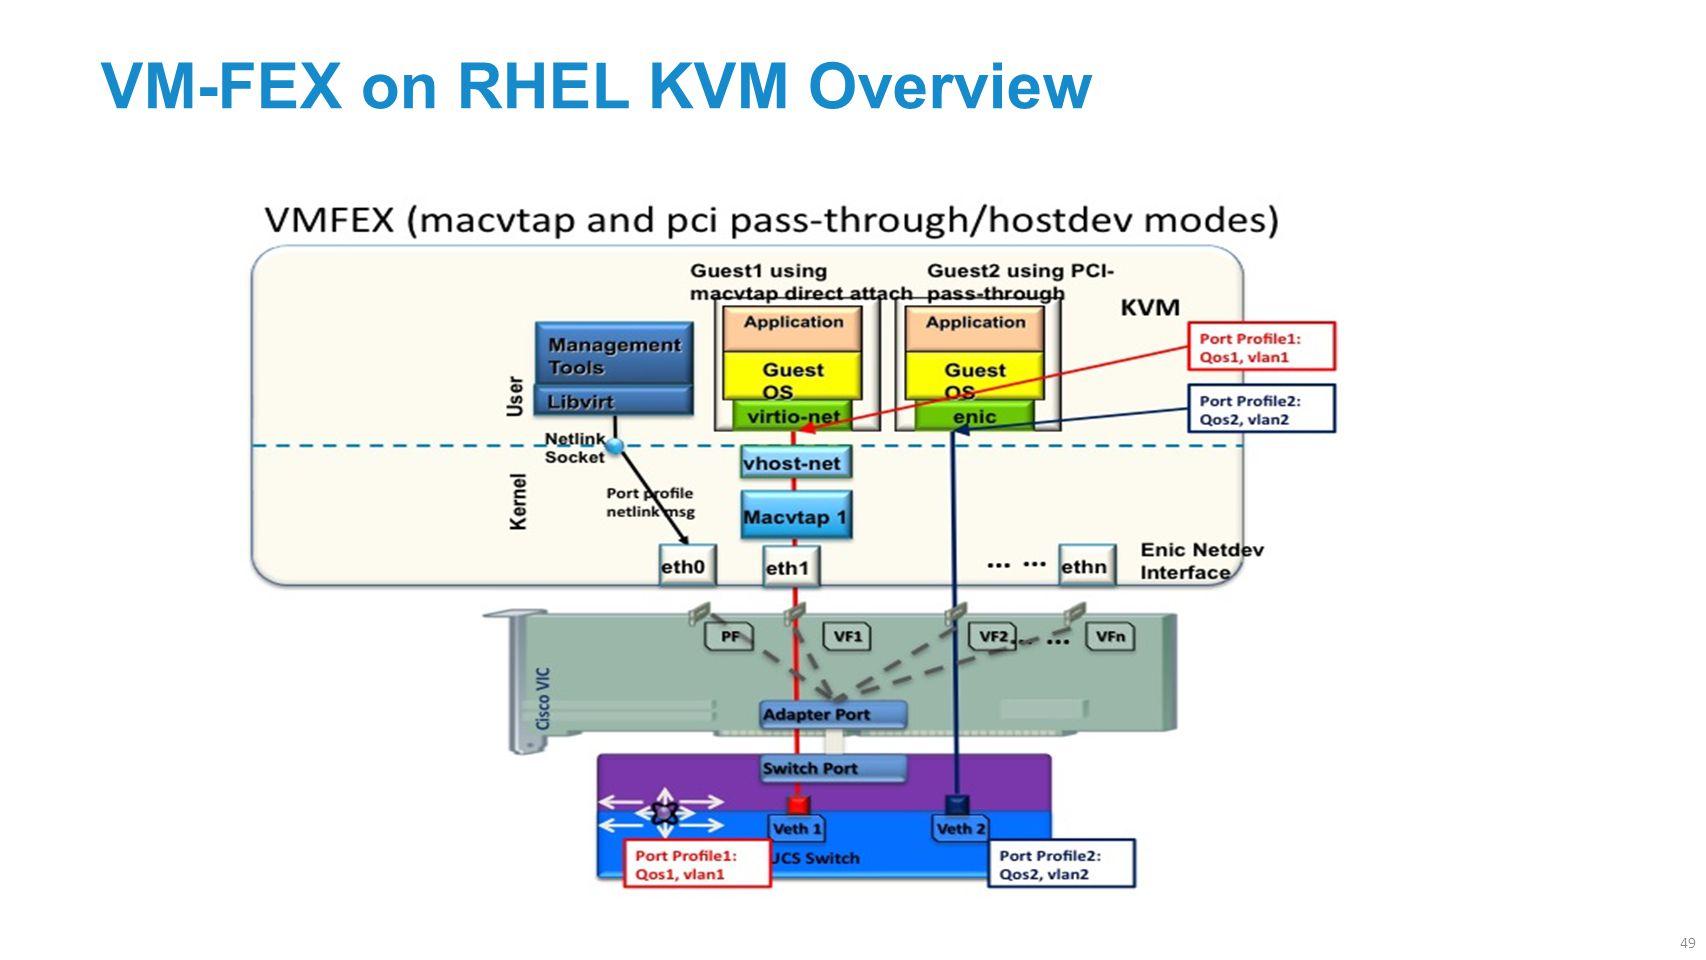 VM-FEX on RHEL KVM Overview 49